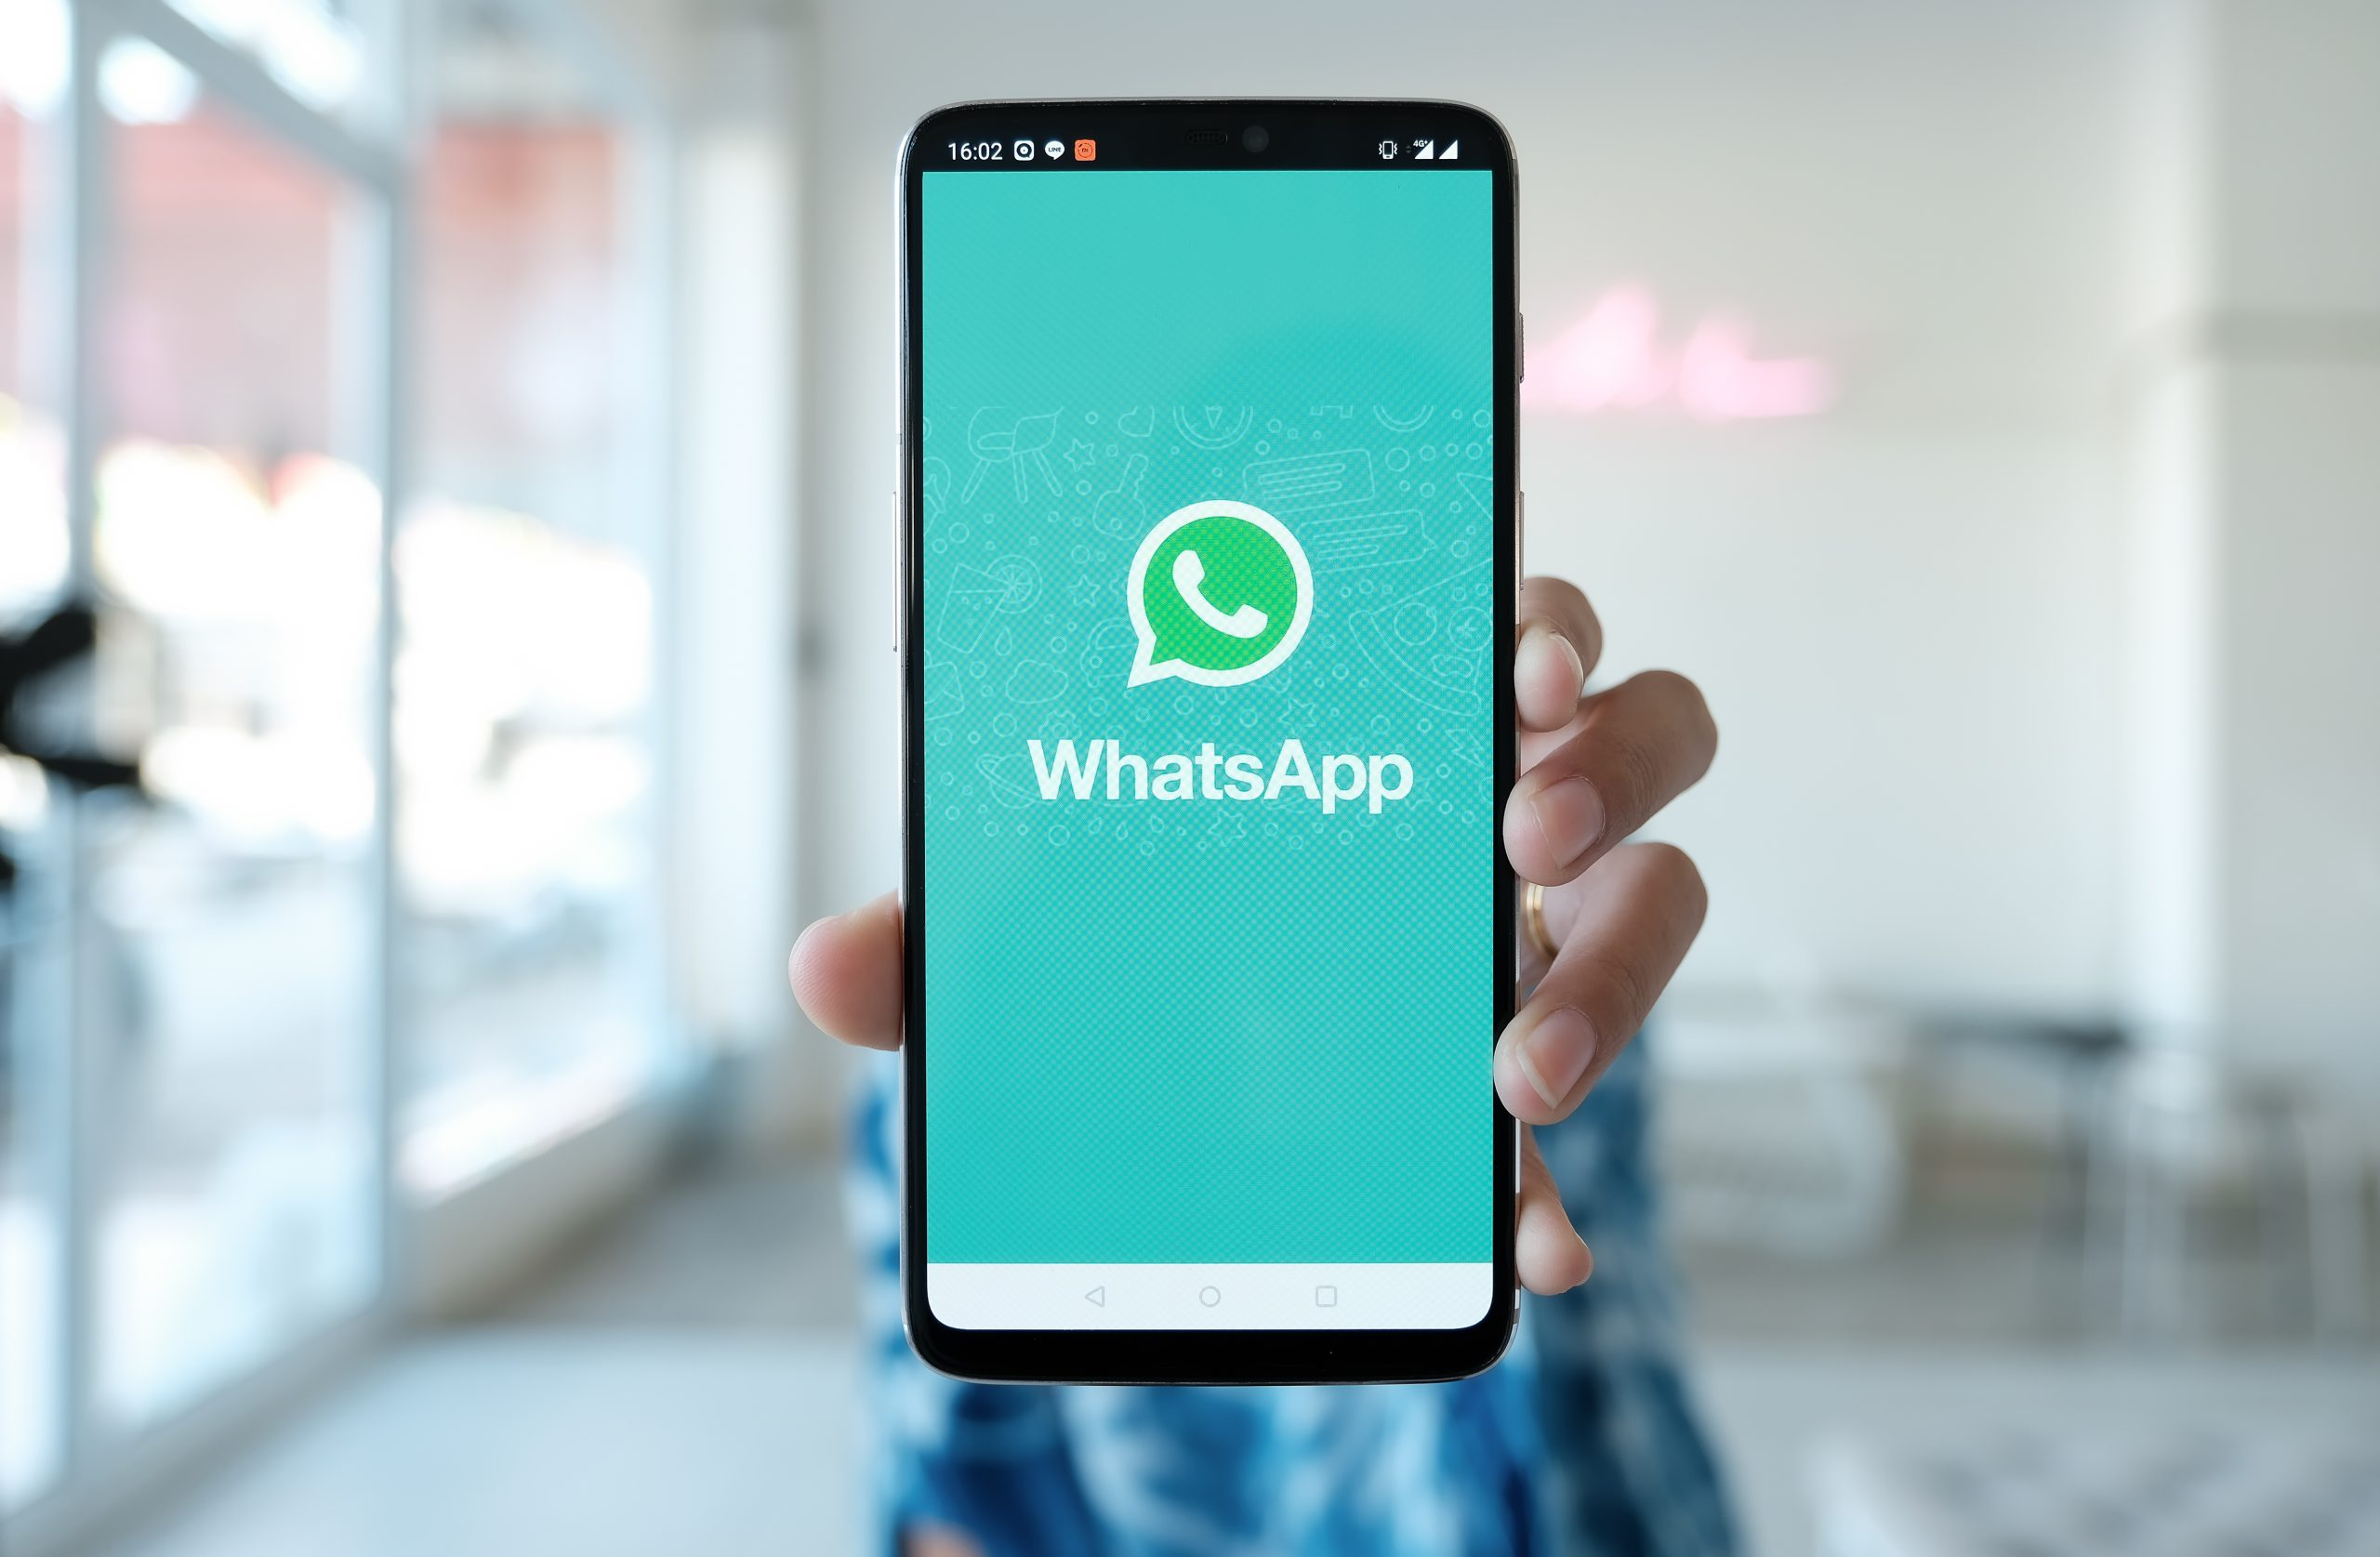 Whatsapp: Activa la verificación de dos pasos para prevenir estafas